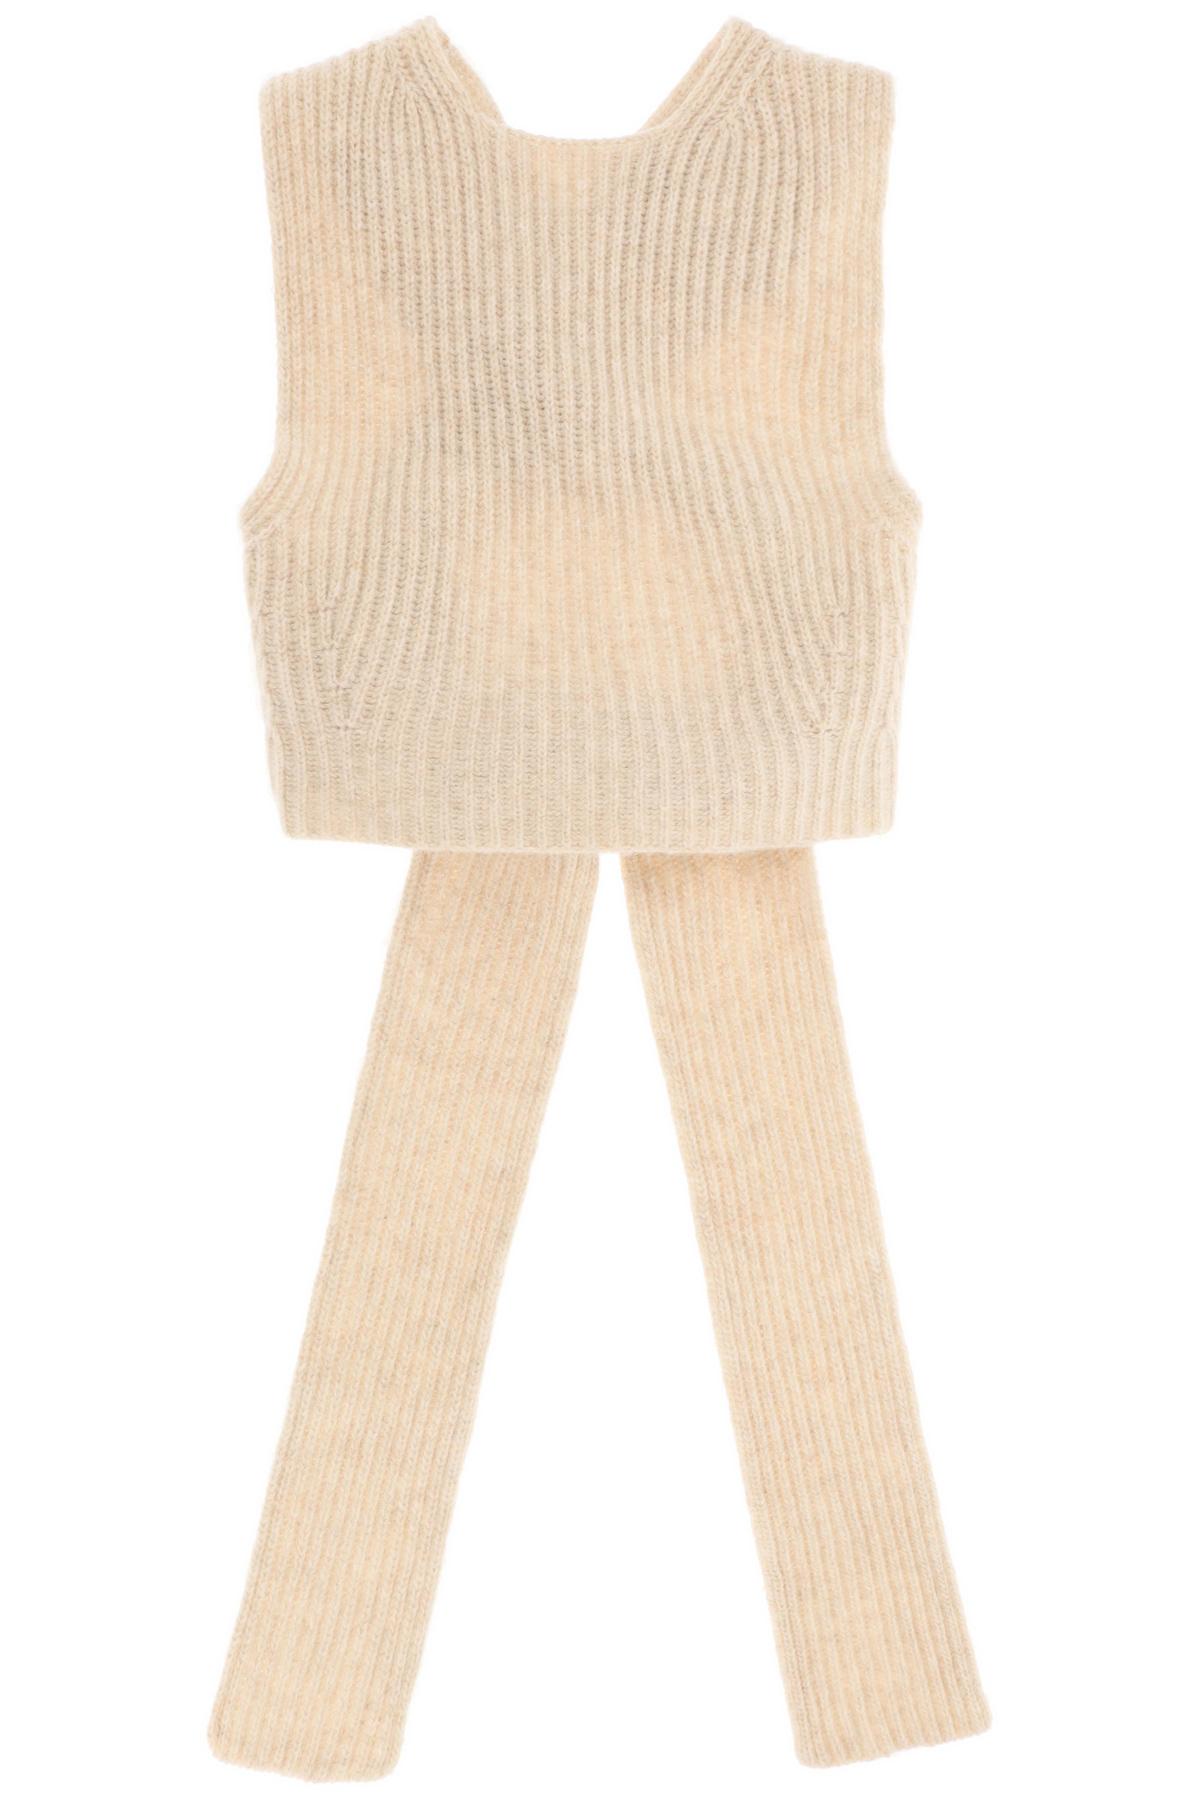 Ganni gilet in lana riciclata